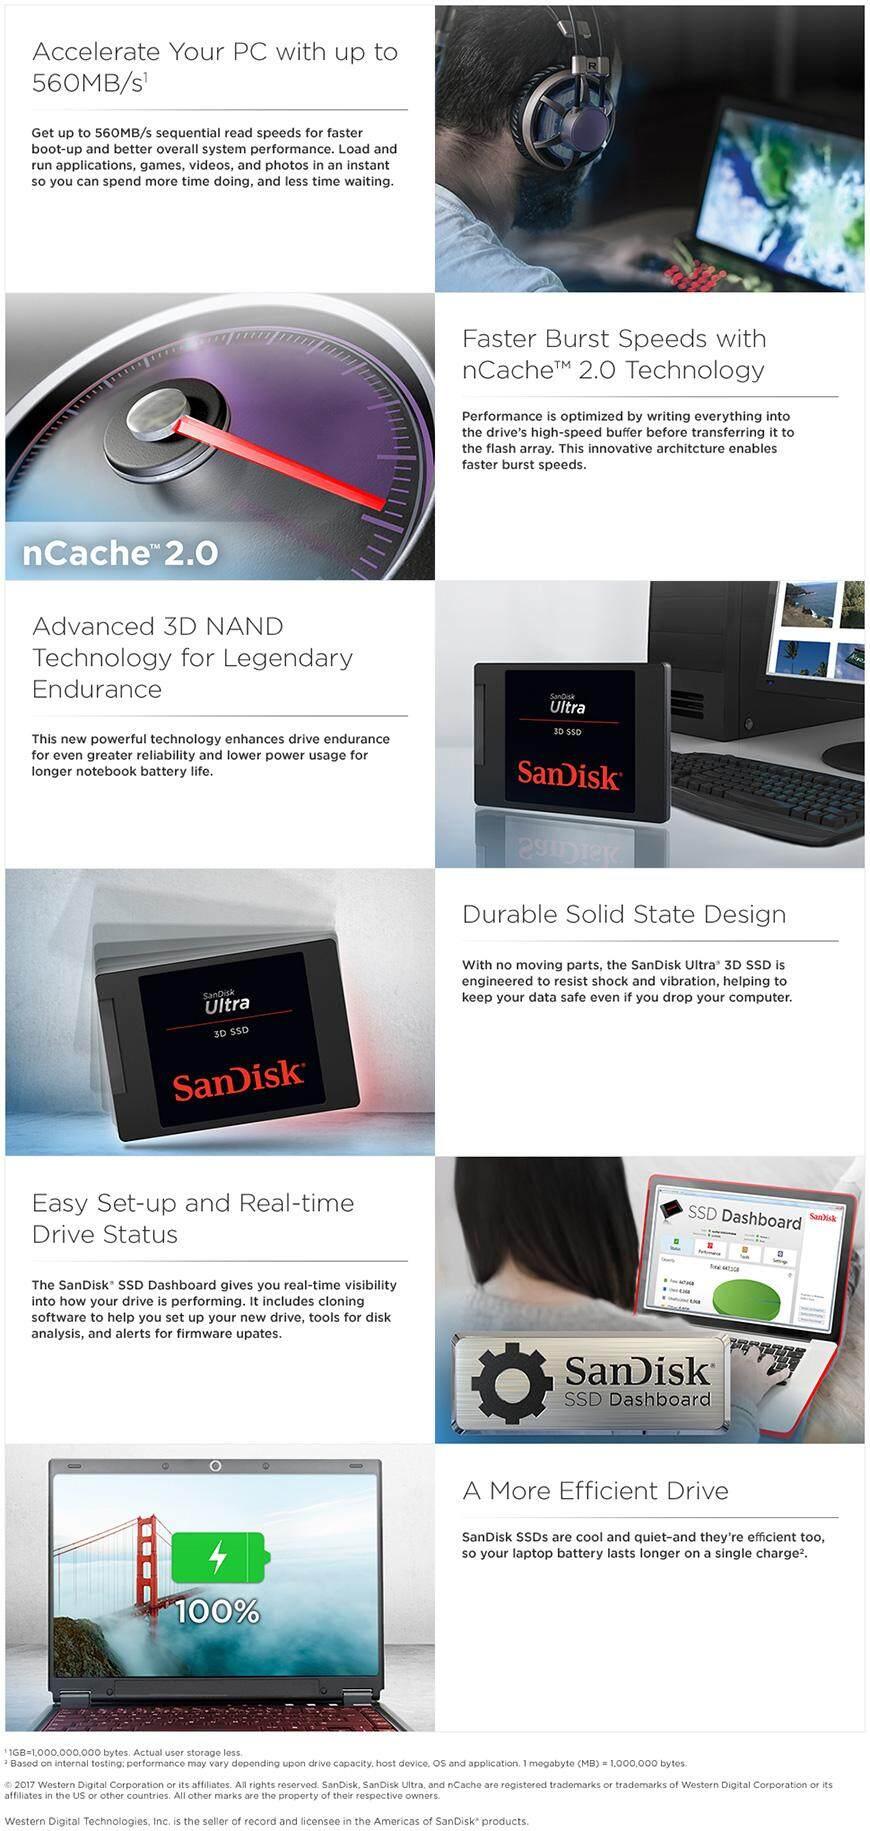 Ultra_3D_SSD_GettingMore.jpg